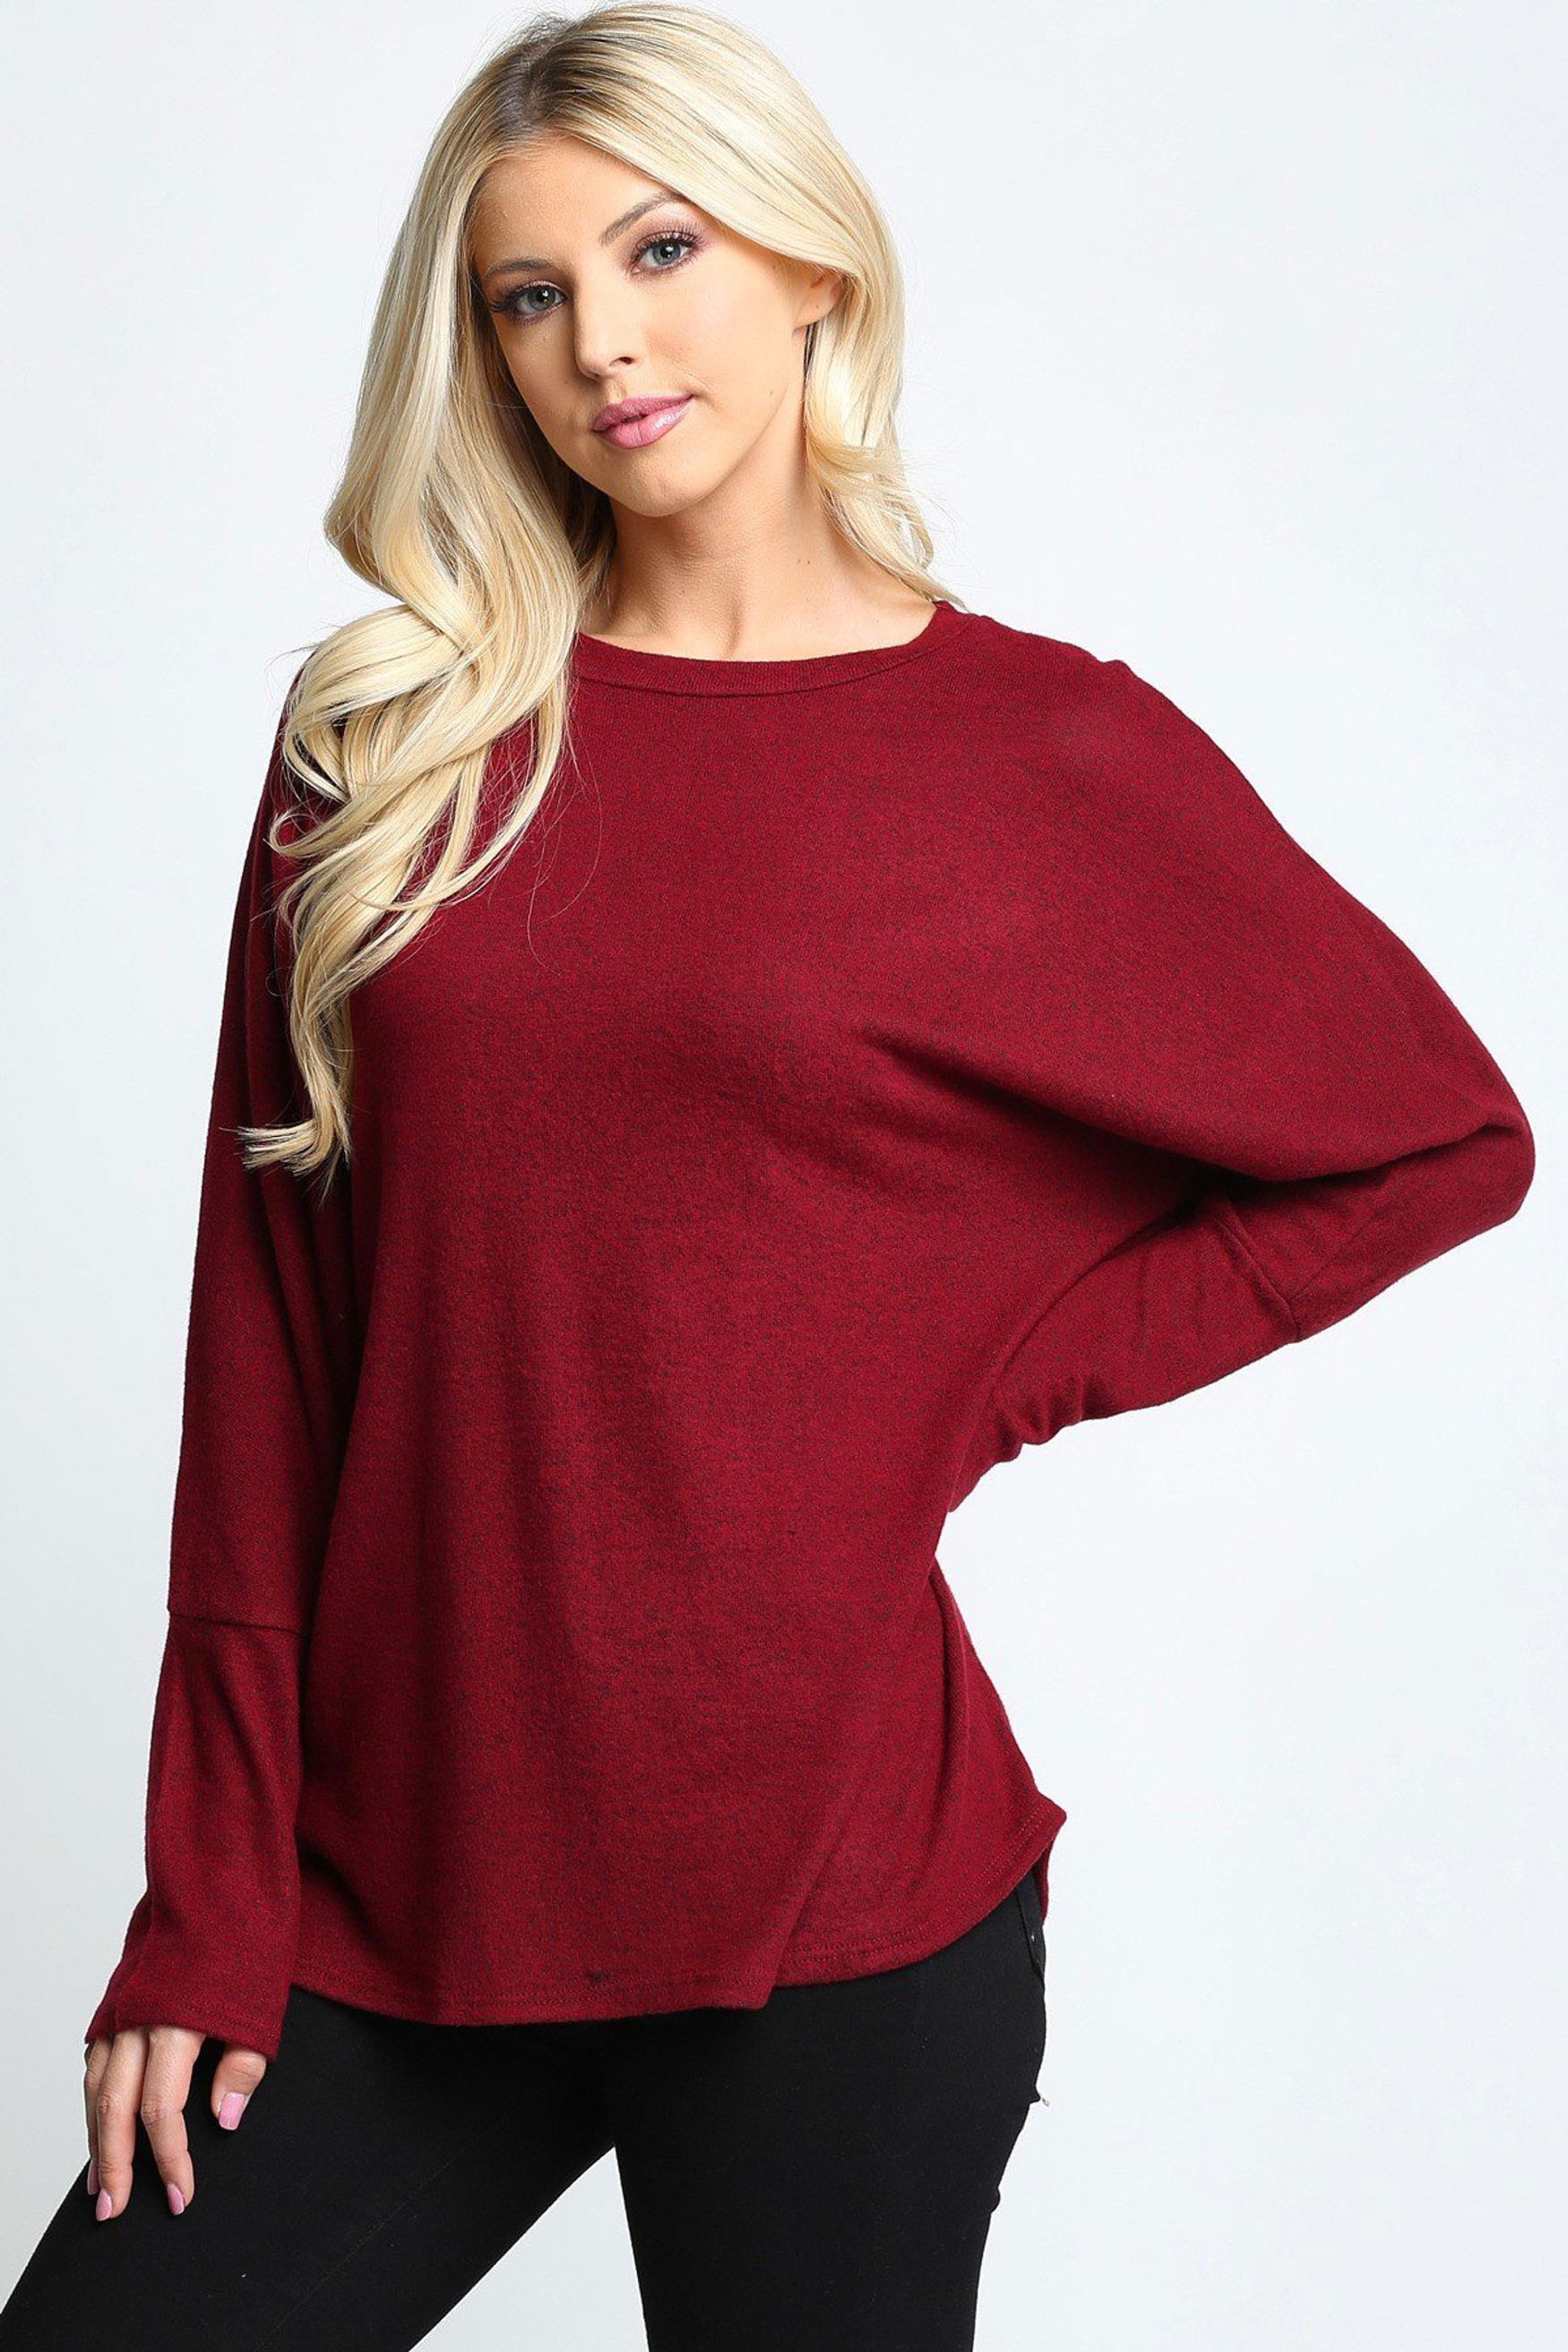 Burgundy Solid Long Sleeve Dolman Plus Size Top